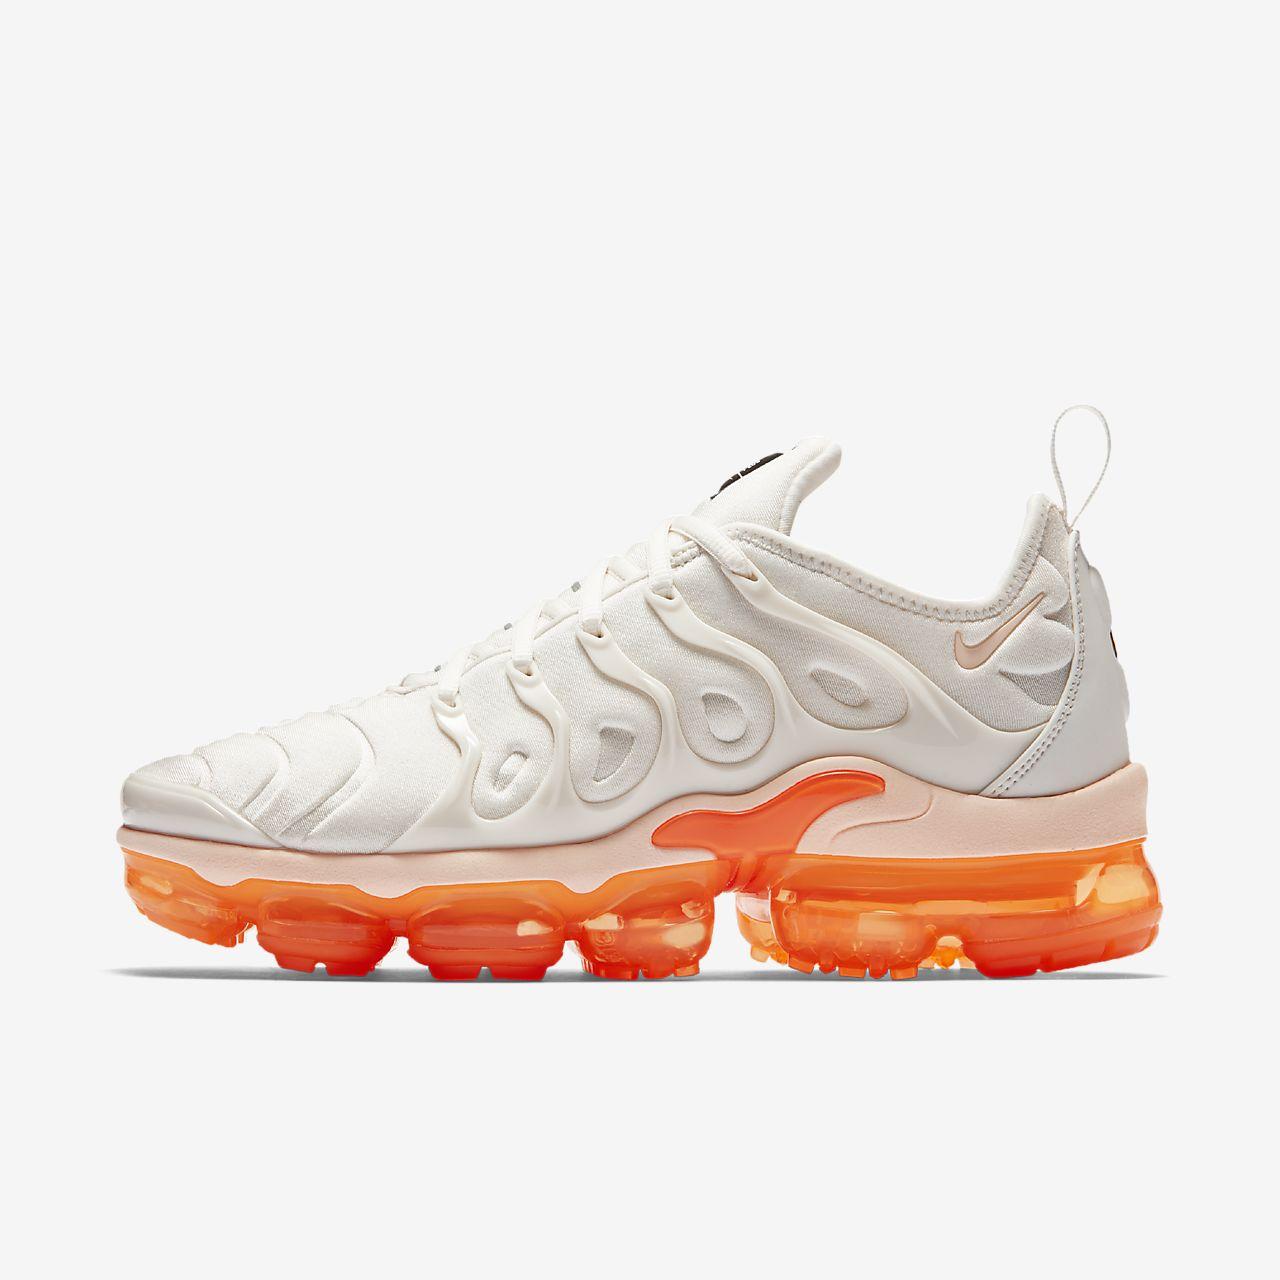 8a6ec855021c3 ... greece nike air vapormax plus womens shoe 0dc46 6a6c8